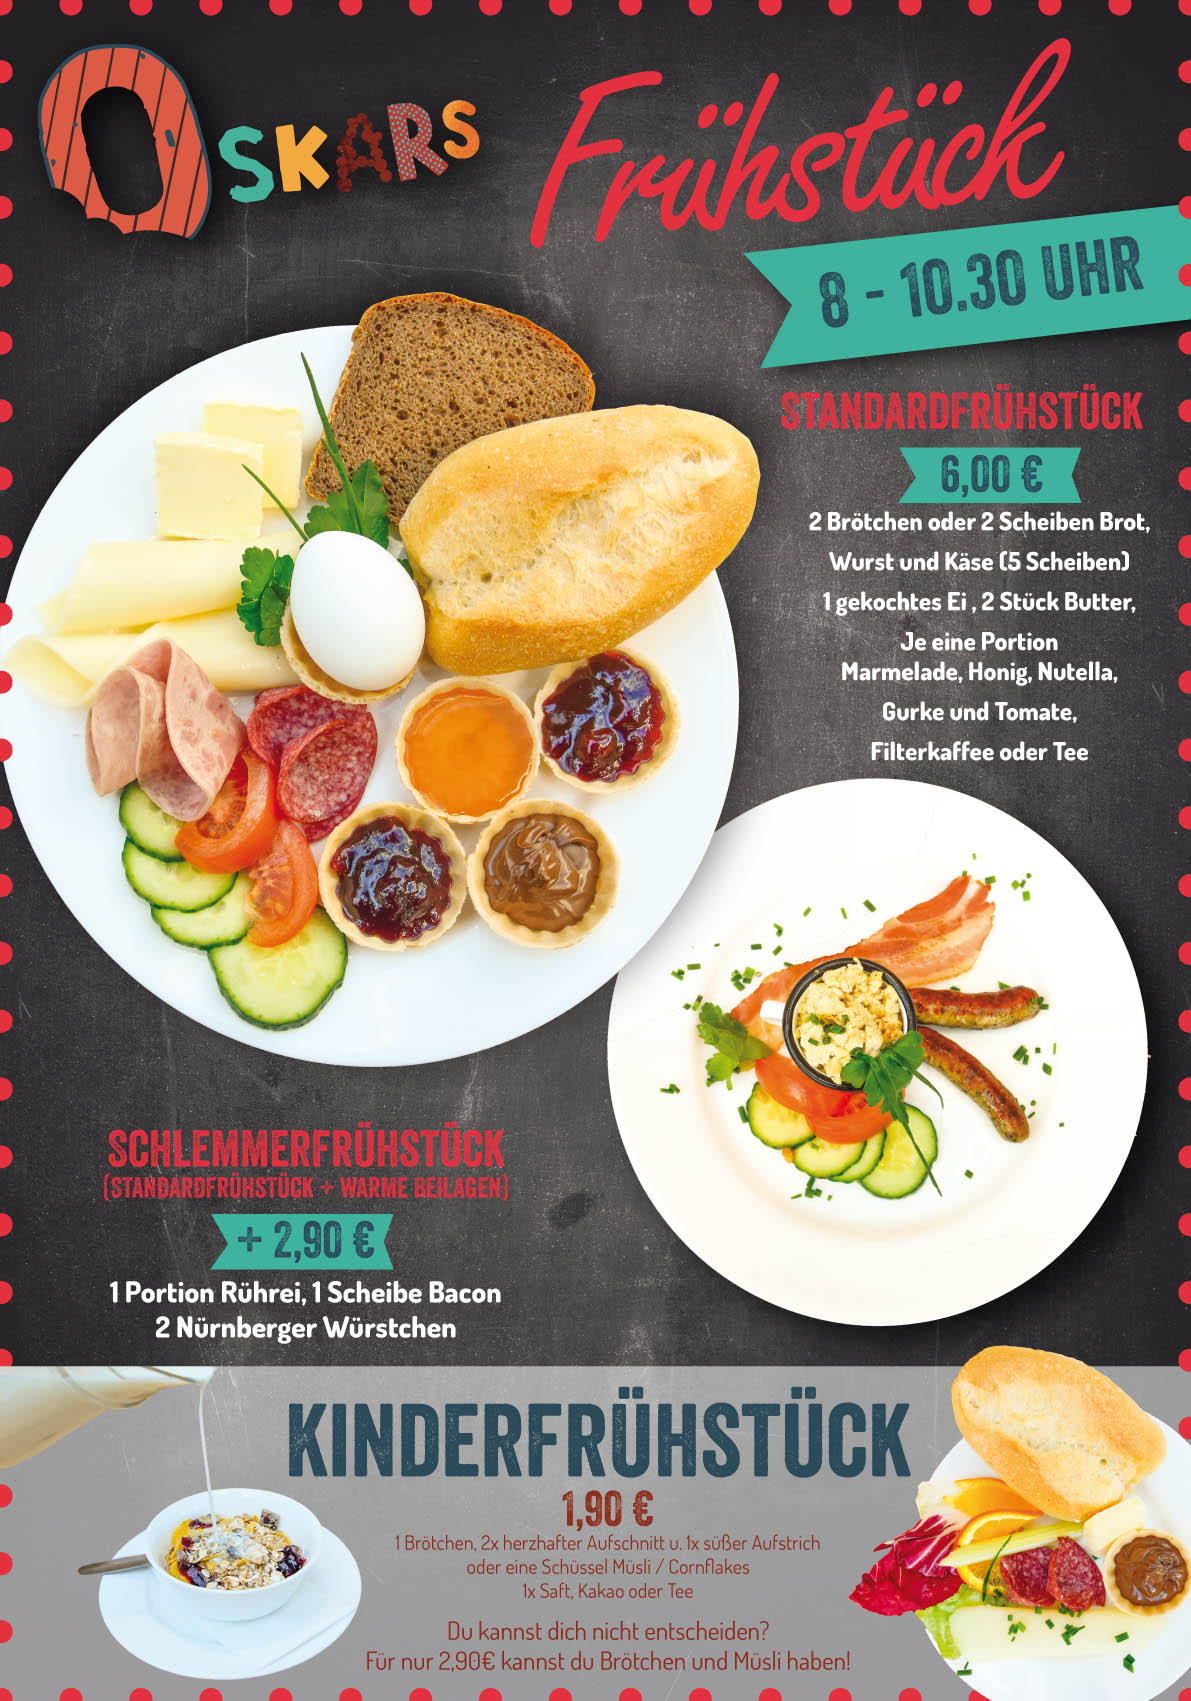 Oskarshausen Frühstück